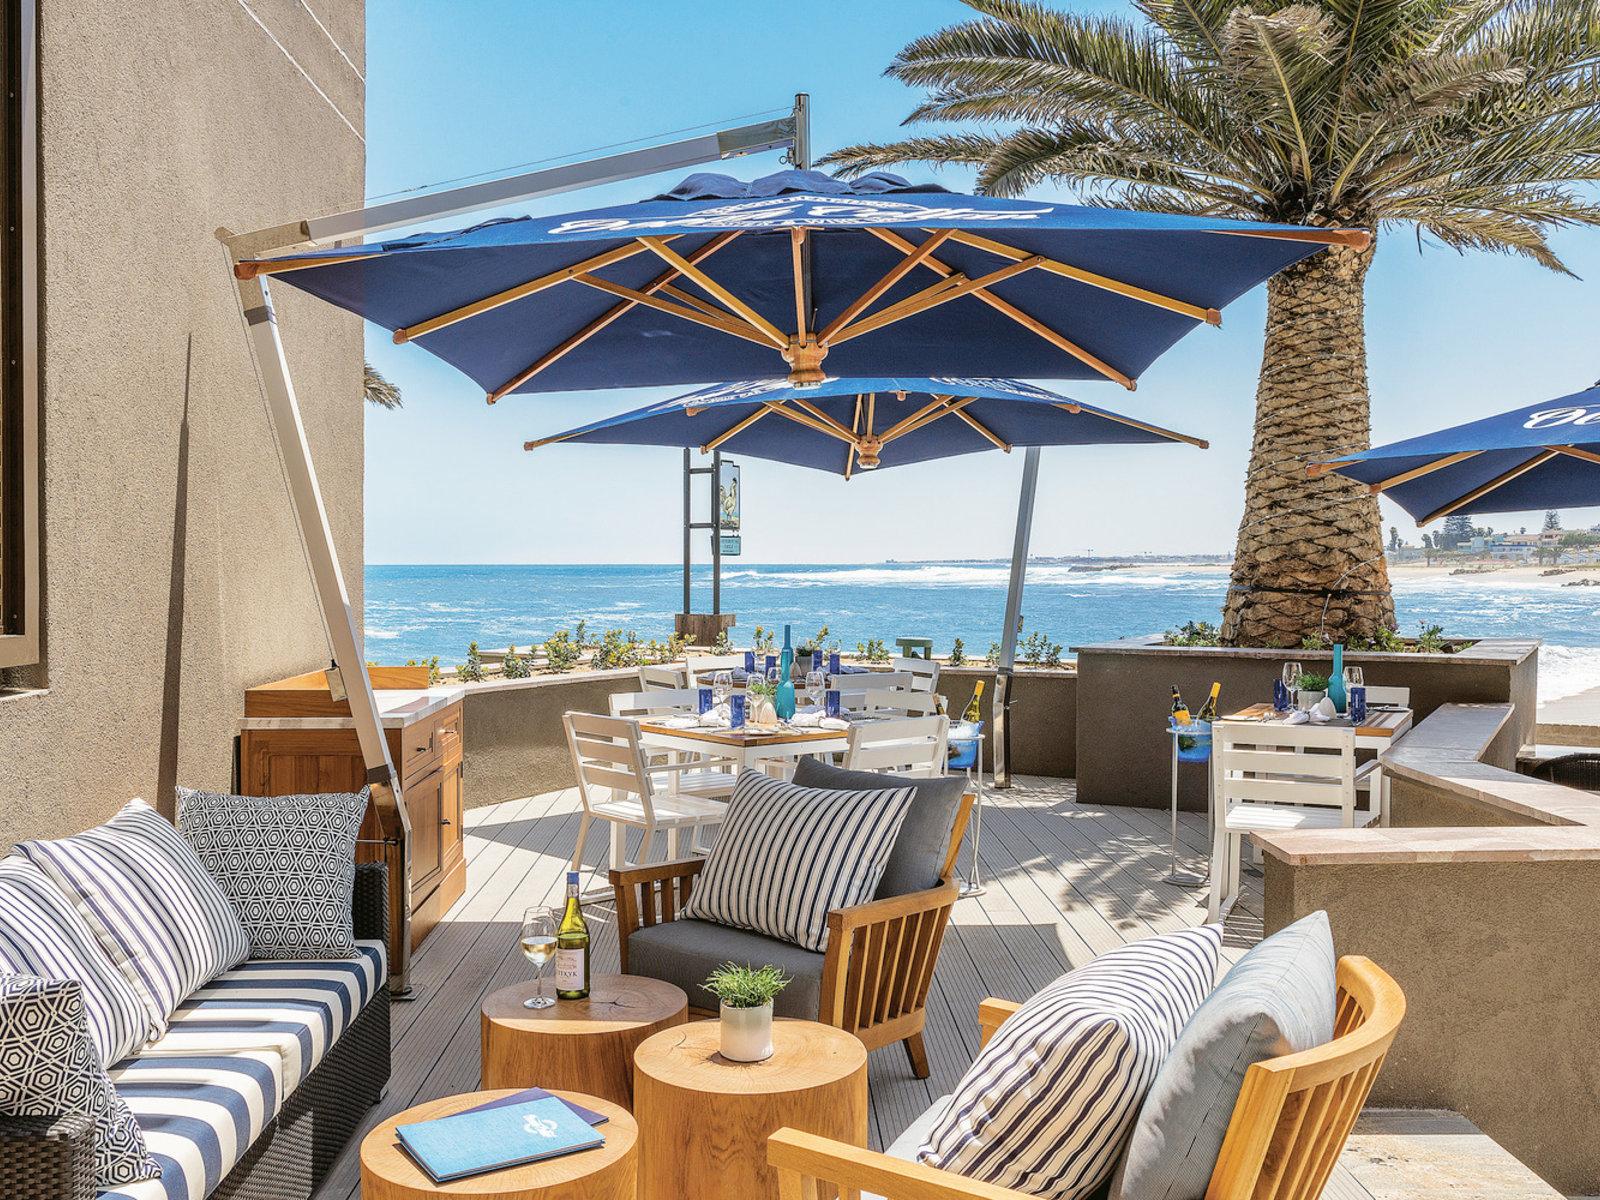 Cafe Mole & Beach Pavillion